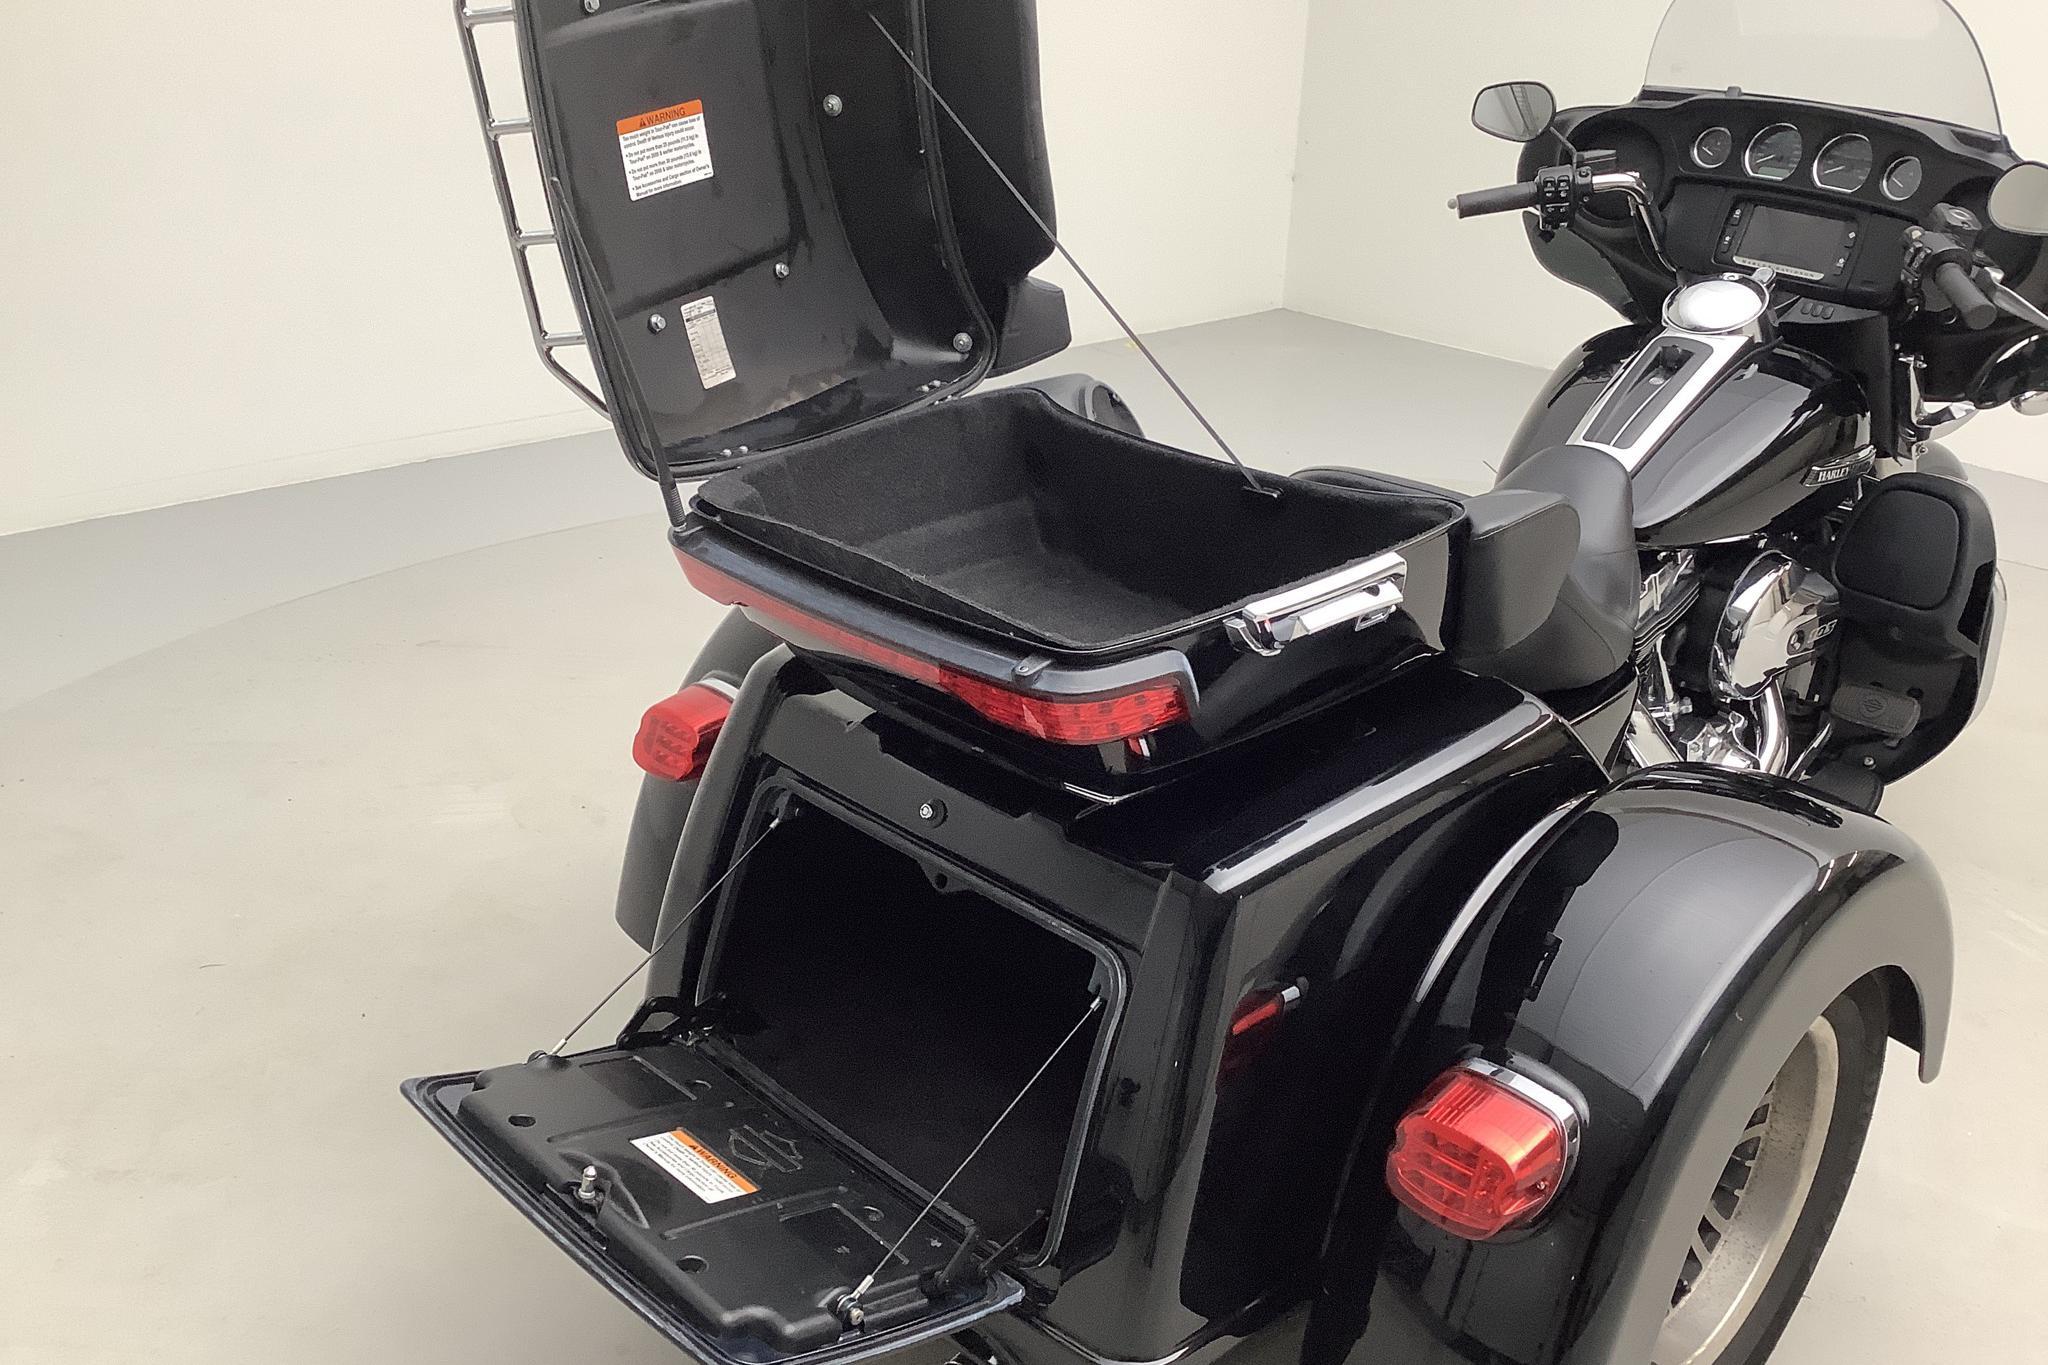 HARLEY-DAVIDSON FLHTCUTG Tri Glide Ultra Motorcykel - 36 070 km - Manual - black - 2016